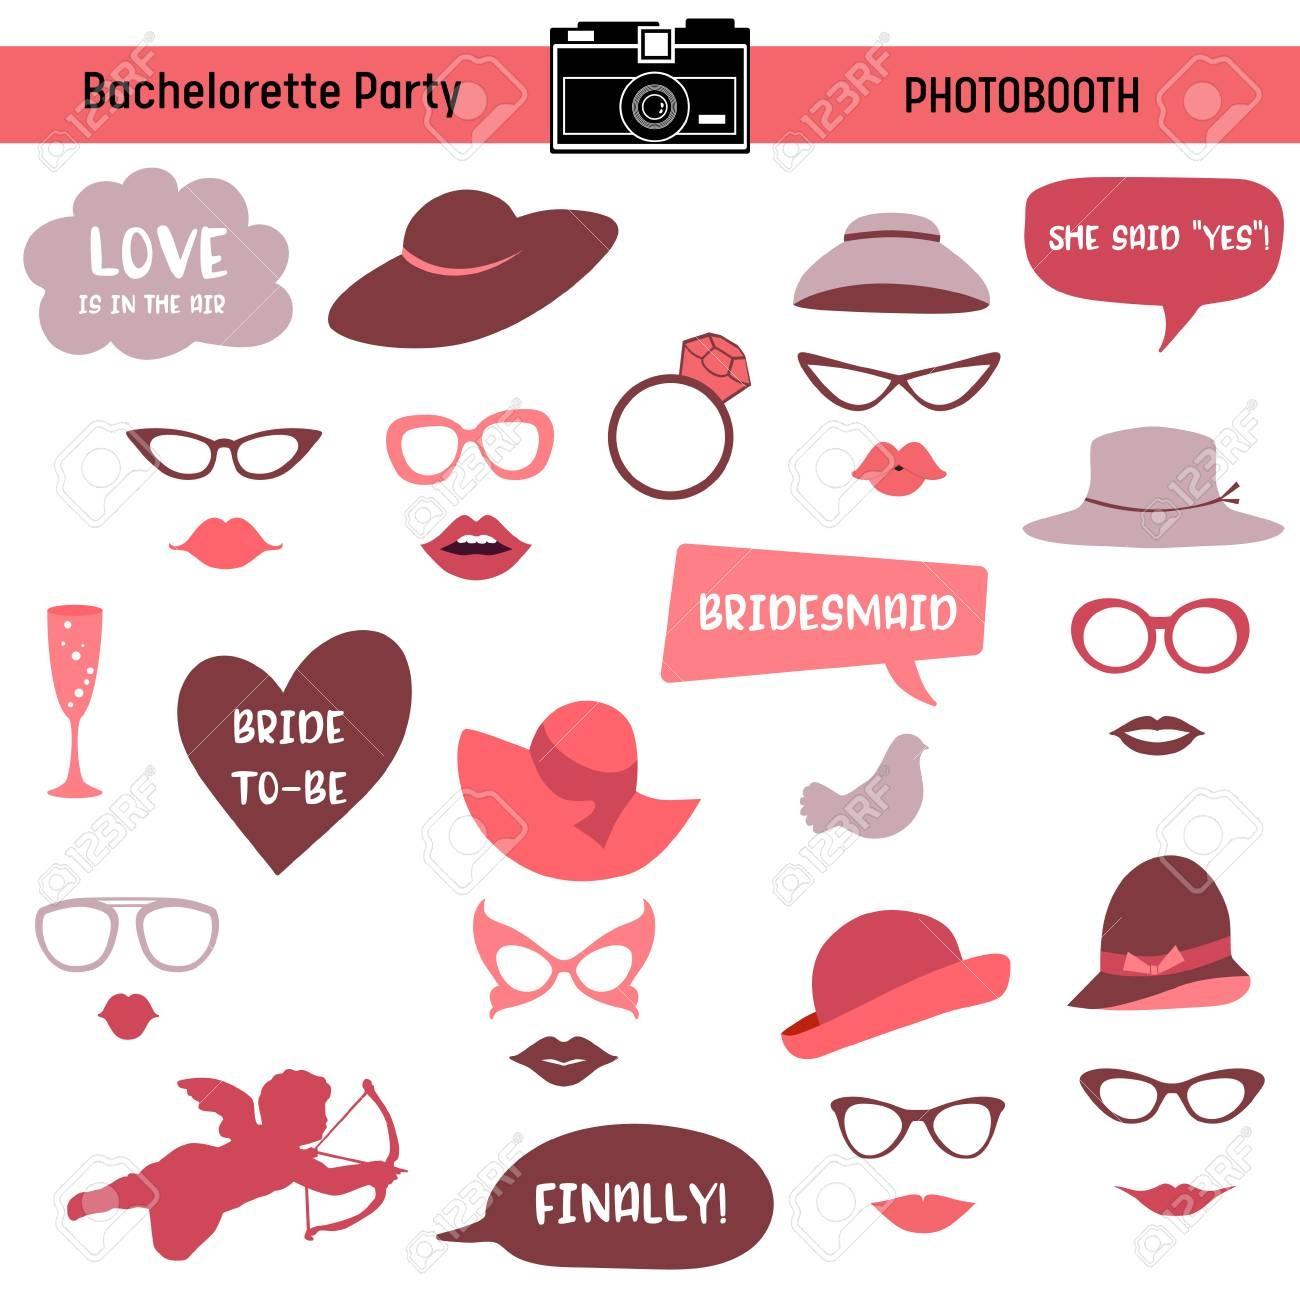 Bachelorette Event, Hen Party, Bridal Shower Printable Glasses - Bachelorette Photo Booth Props Printable Free